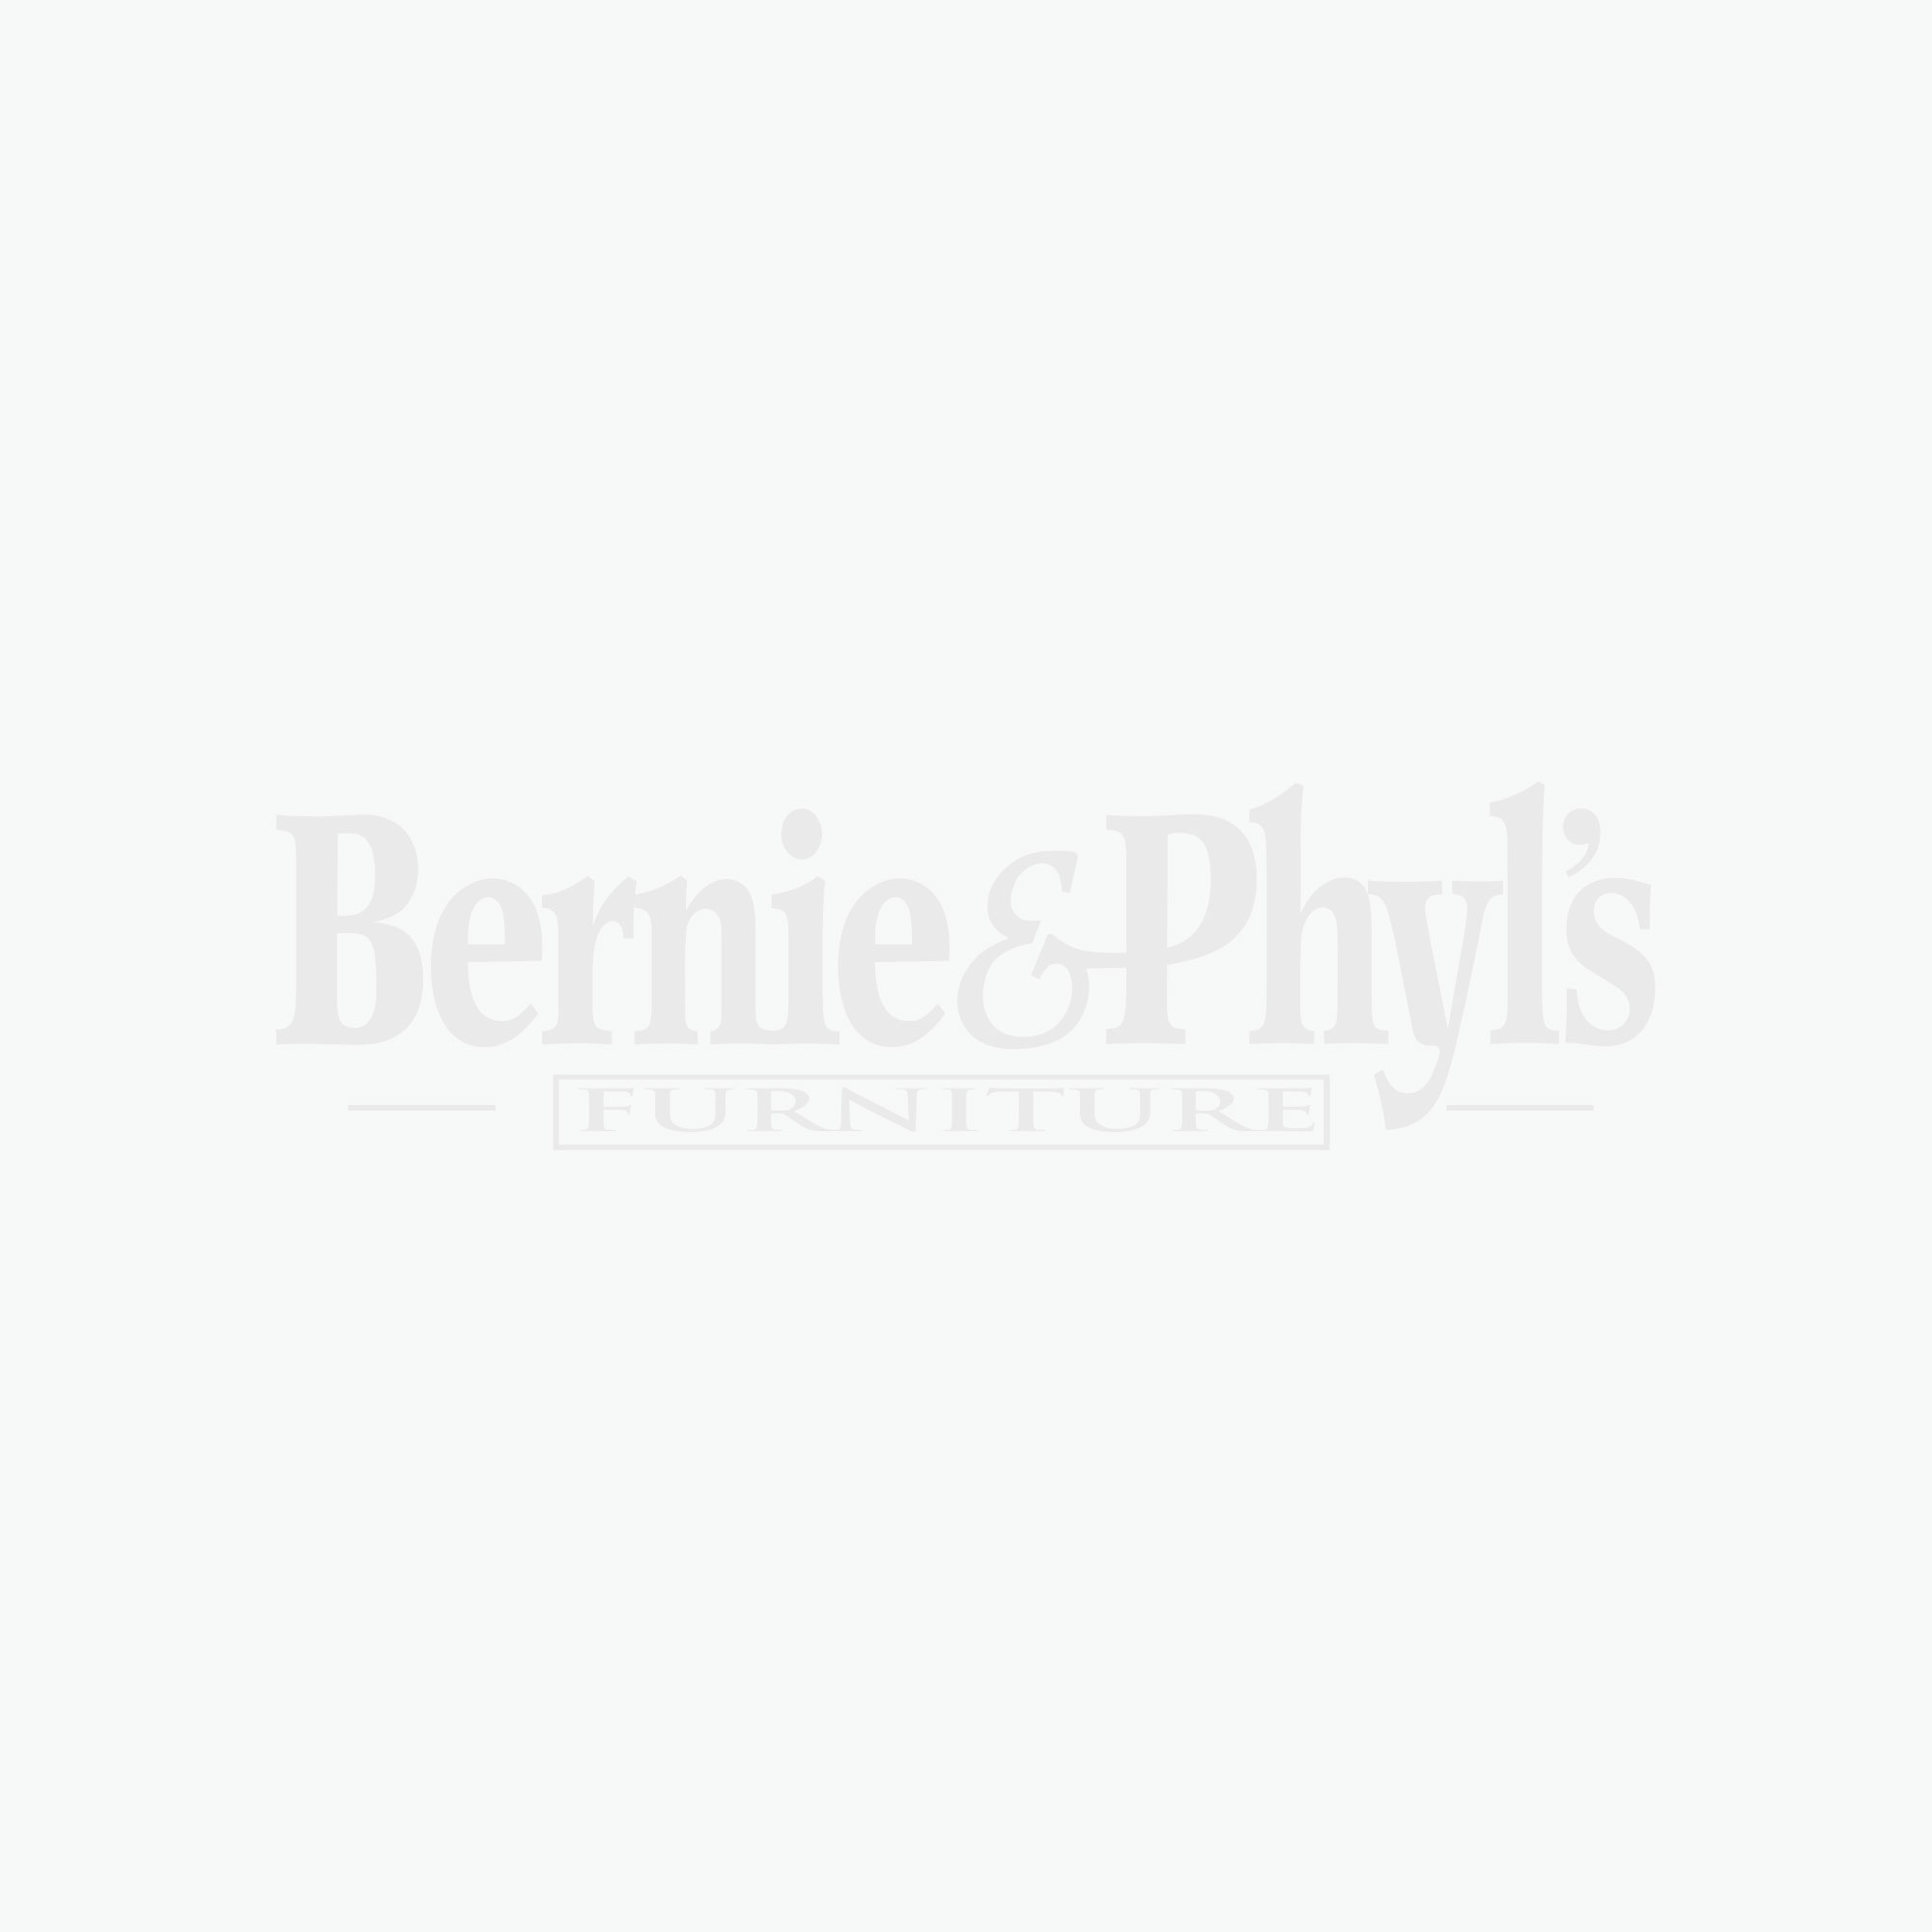 Hamilton-Franklin Cherry Bedroom Headboard